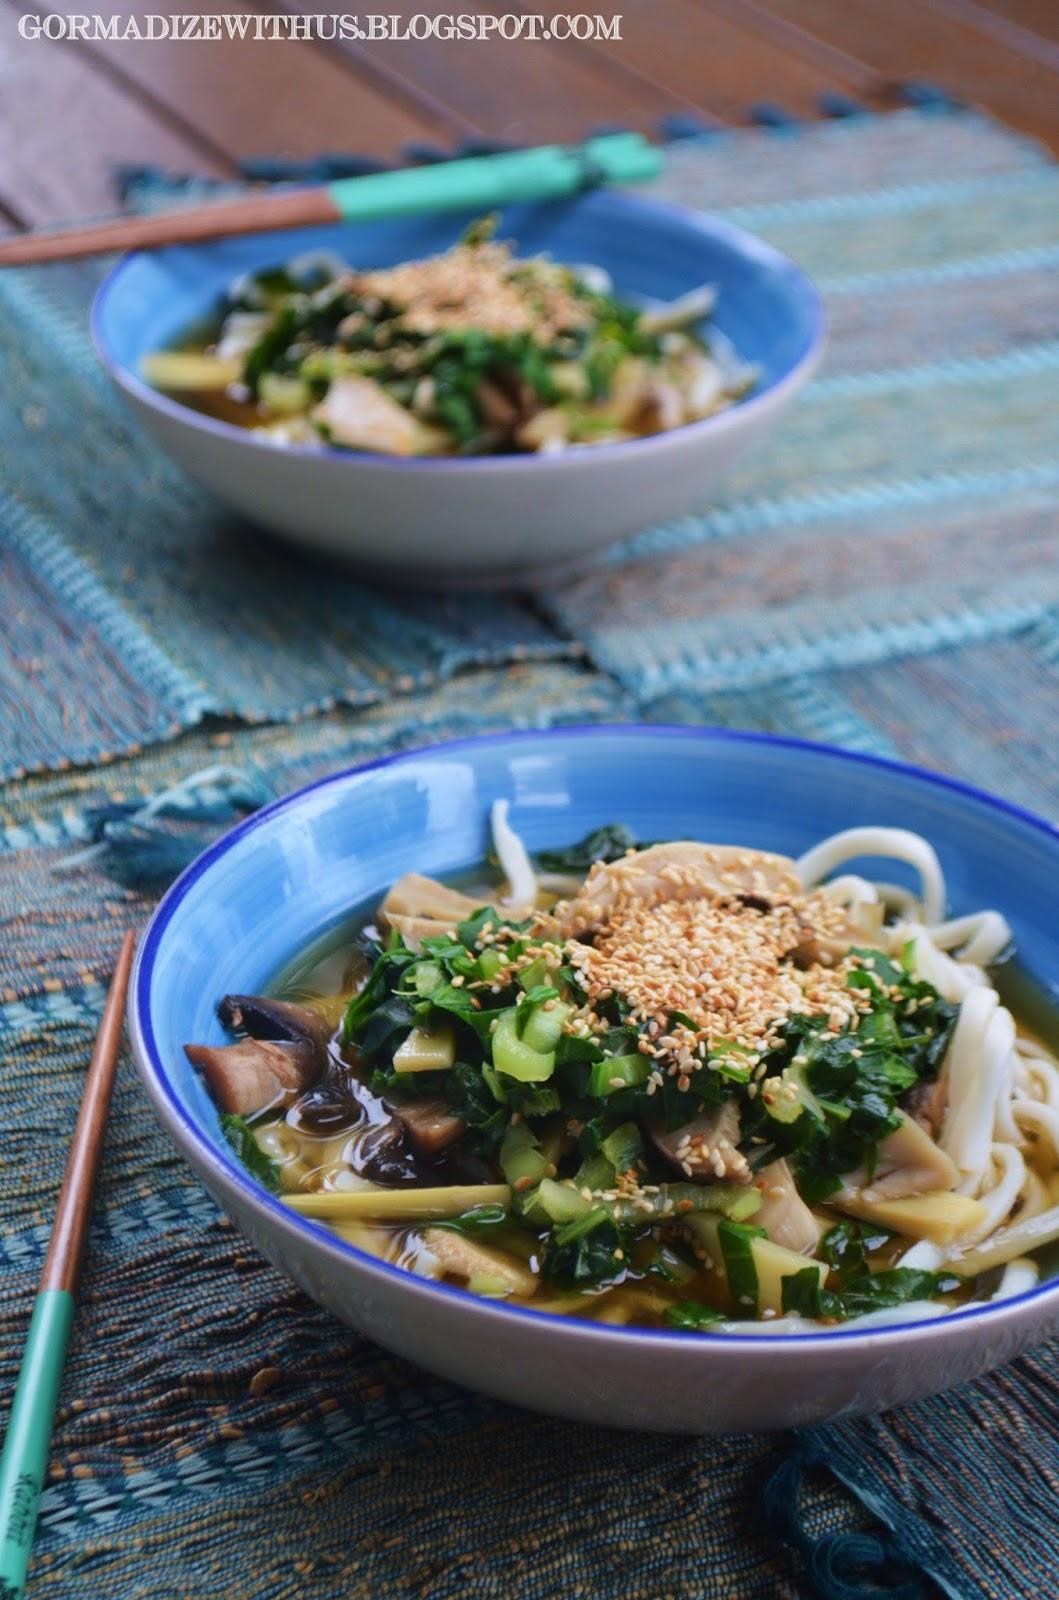 Gormandize: Spinach, Mushroom & Sesame Udon Noodle Soup